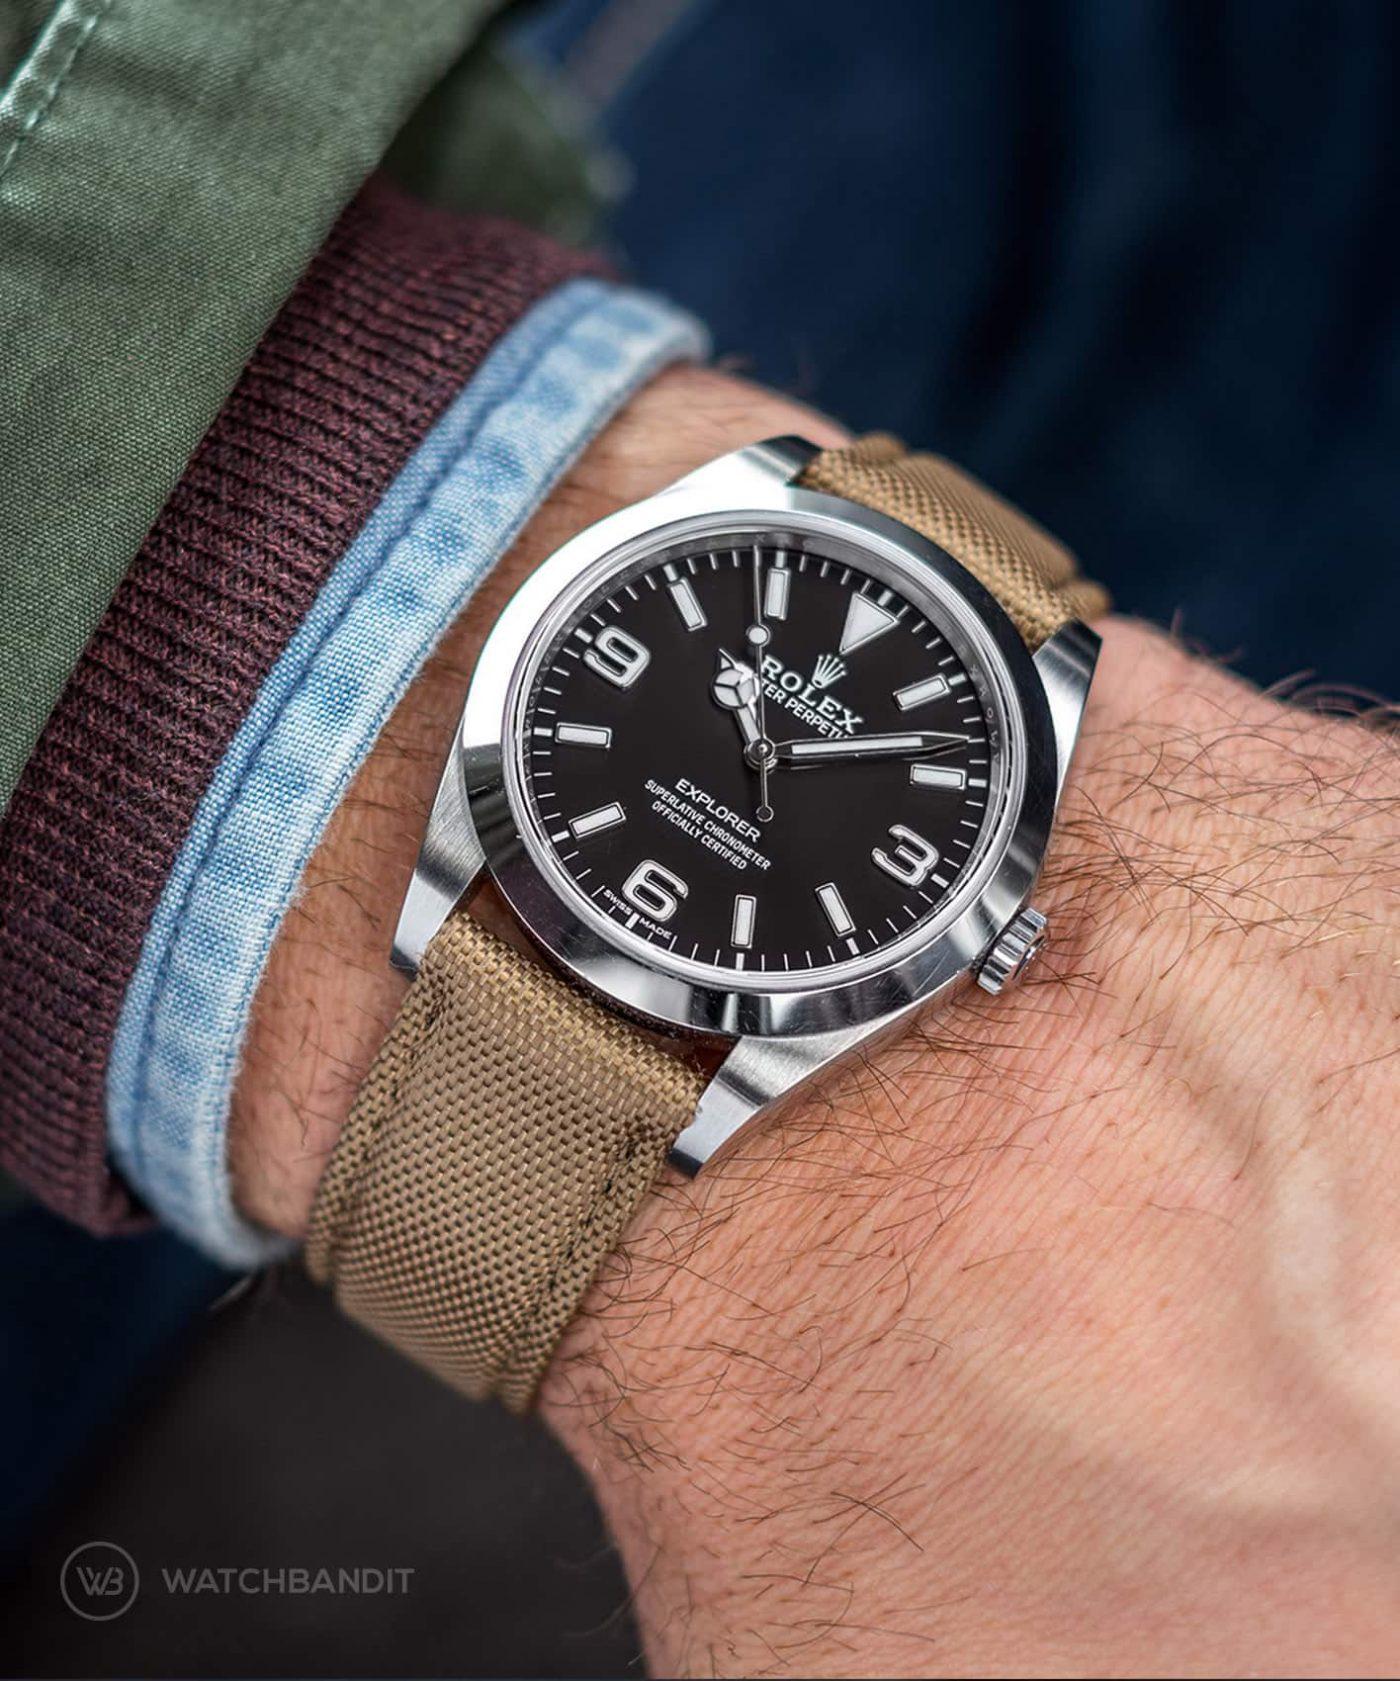 Rolex Explorer I Watchbandit Cordura Strap Khaki